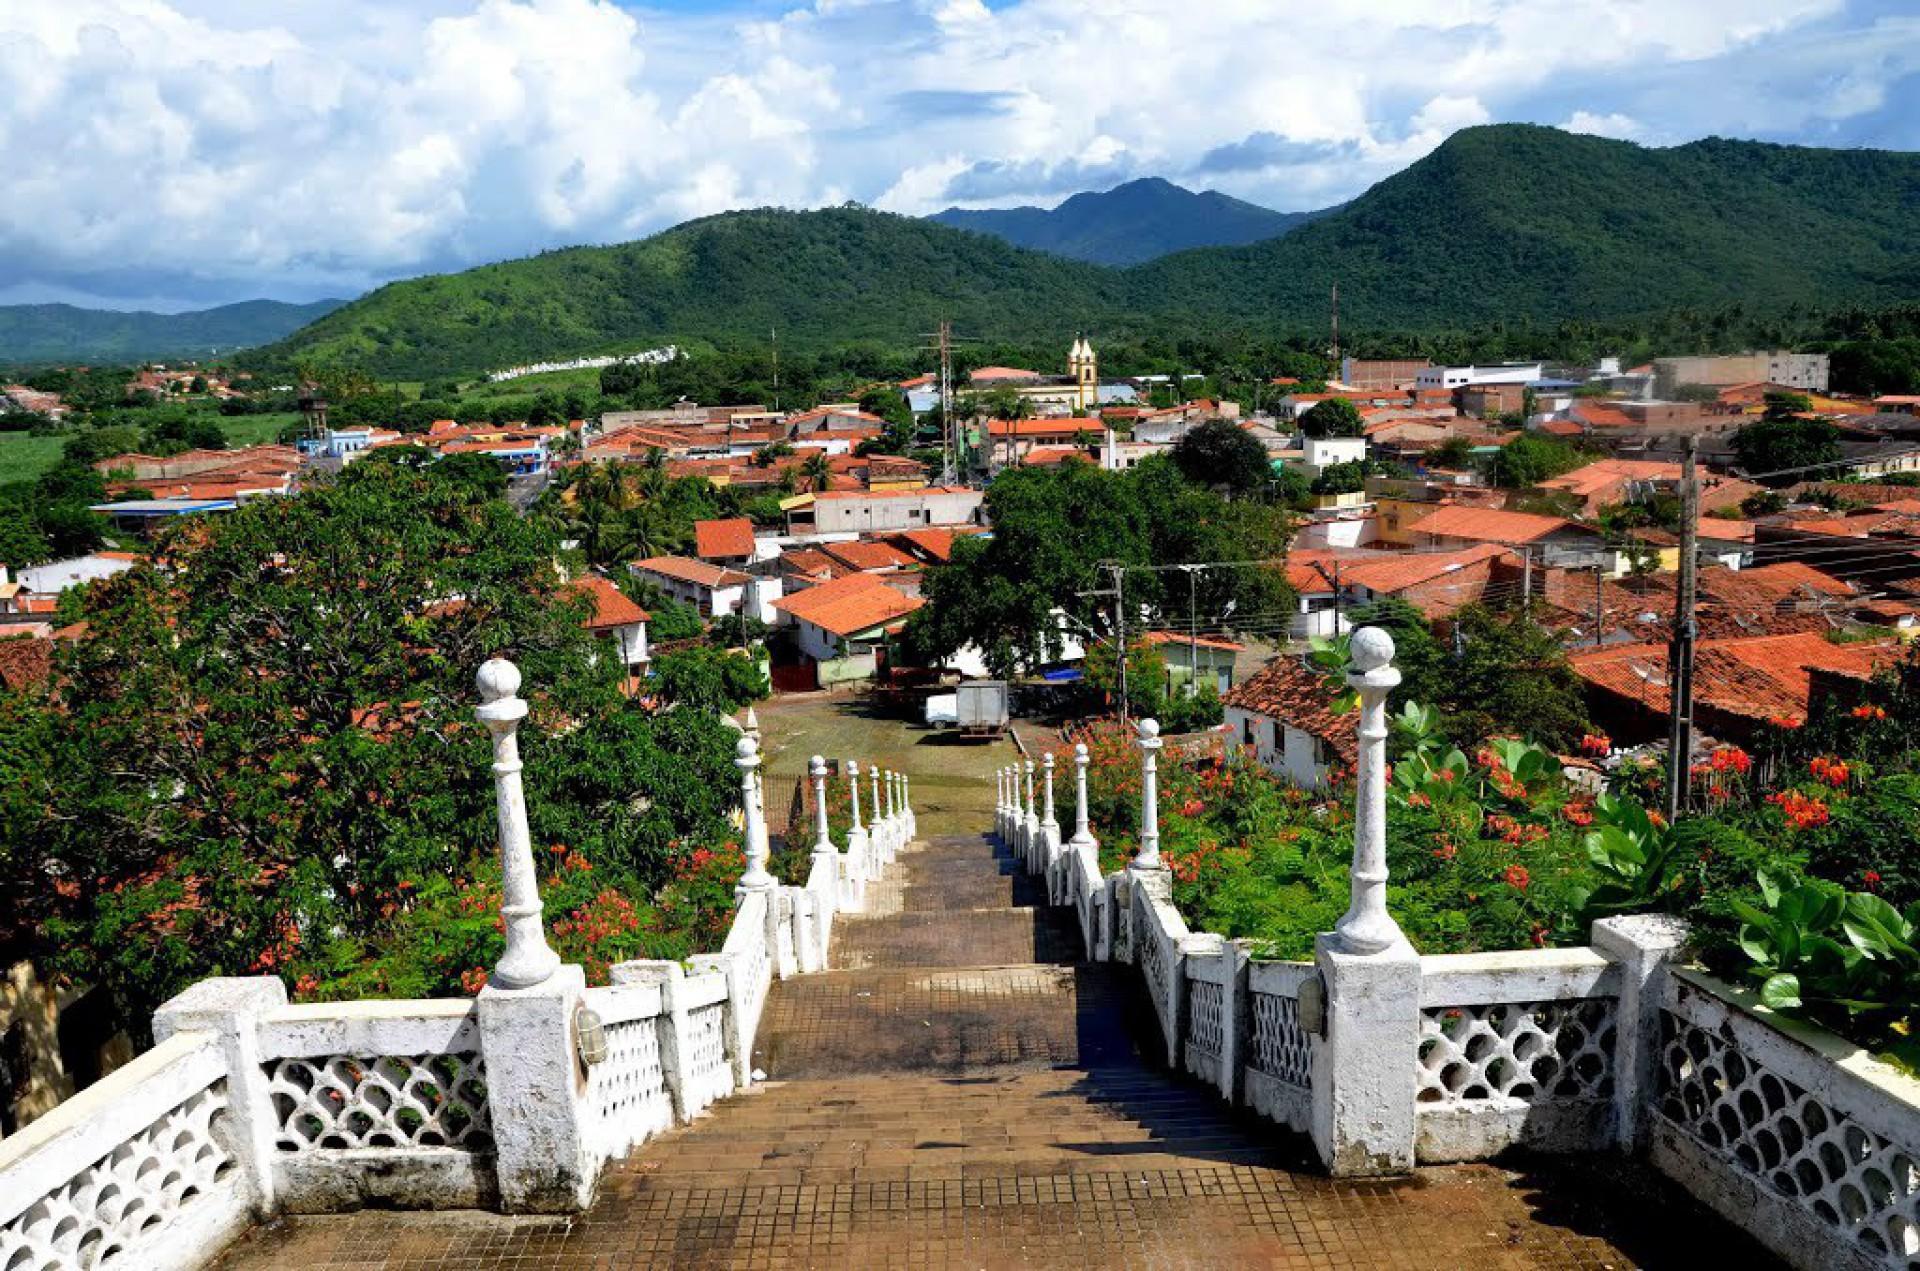 Fonte: www.opovo.com.br